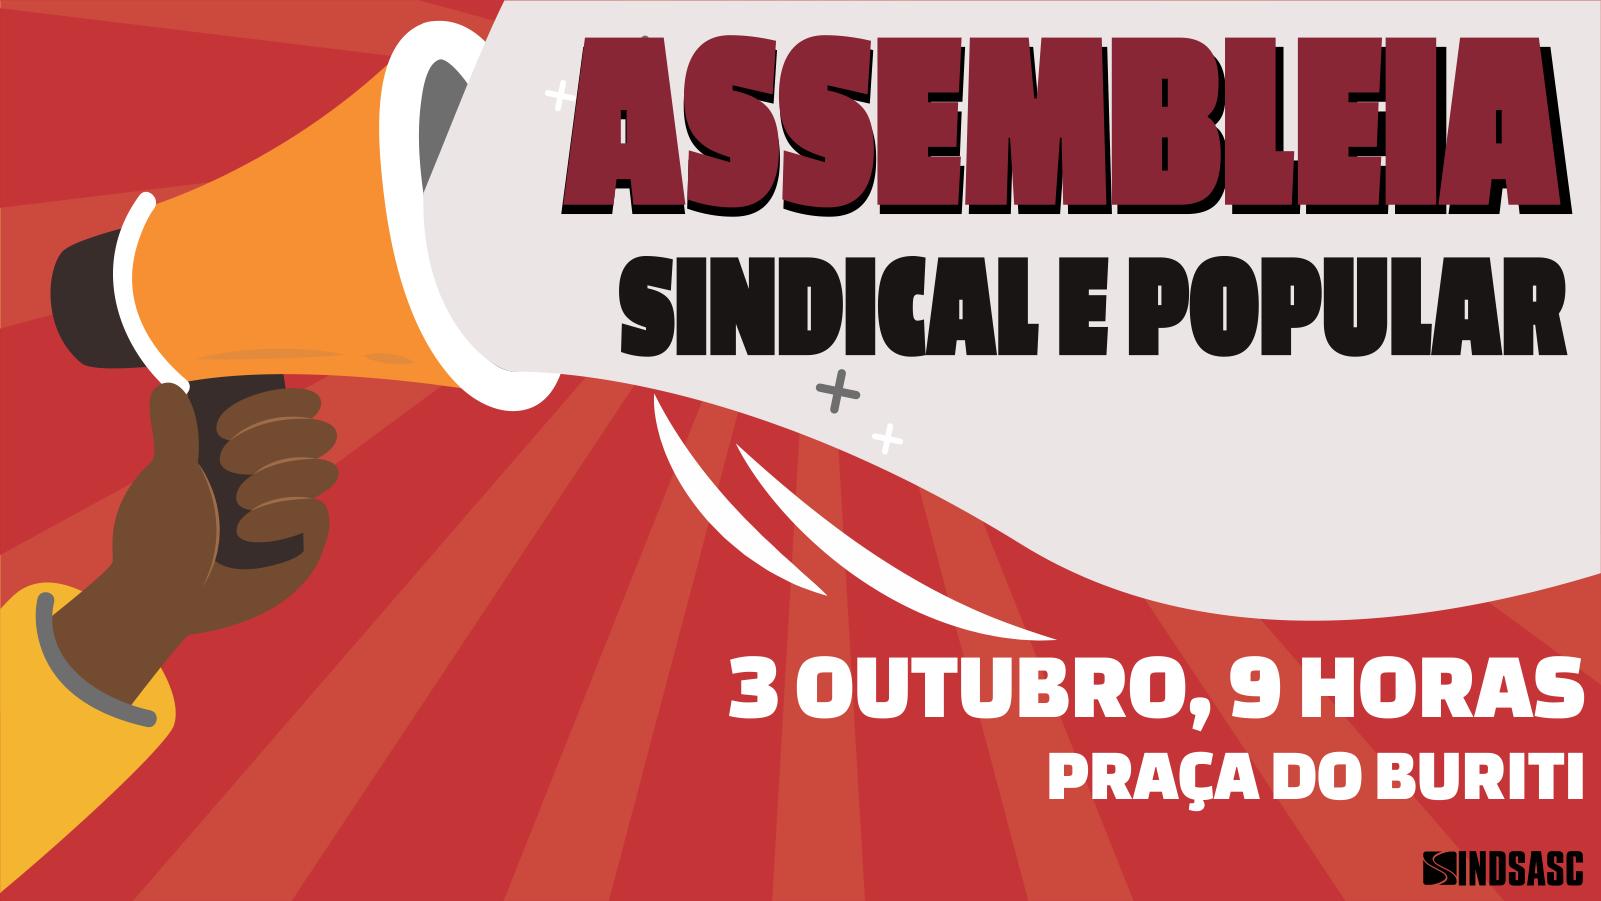 3 de outubro é dia de assembleia sindical e popular do Sindsasc